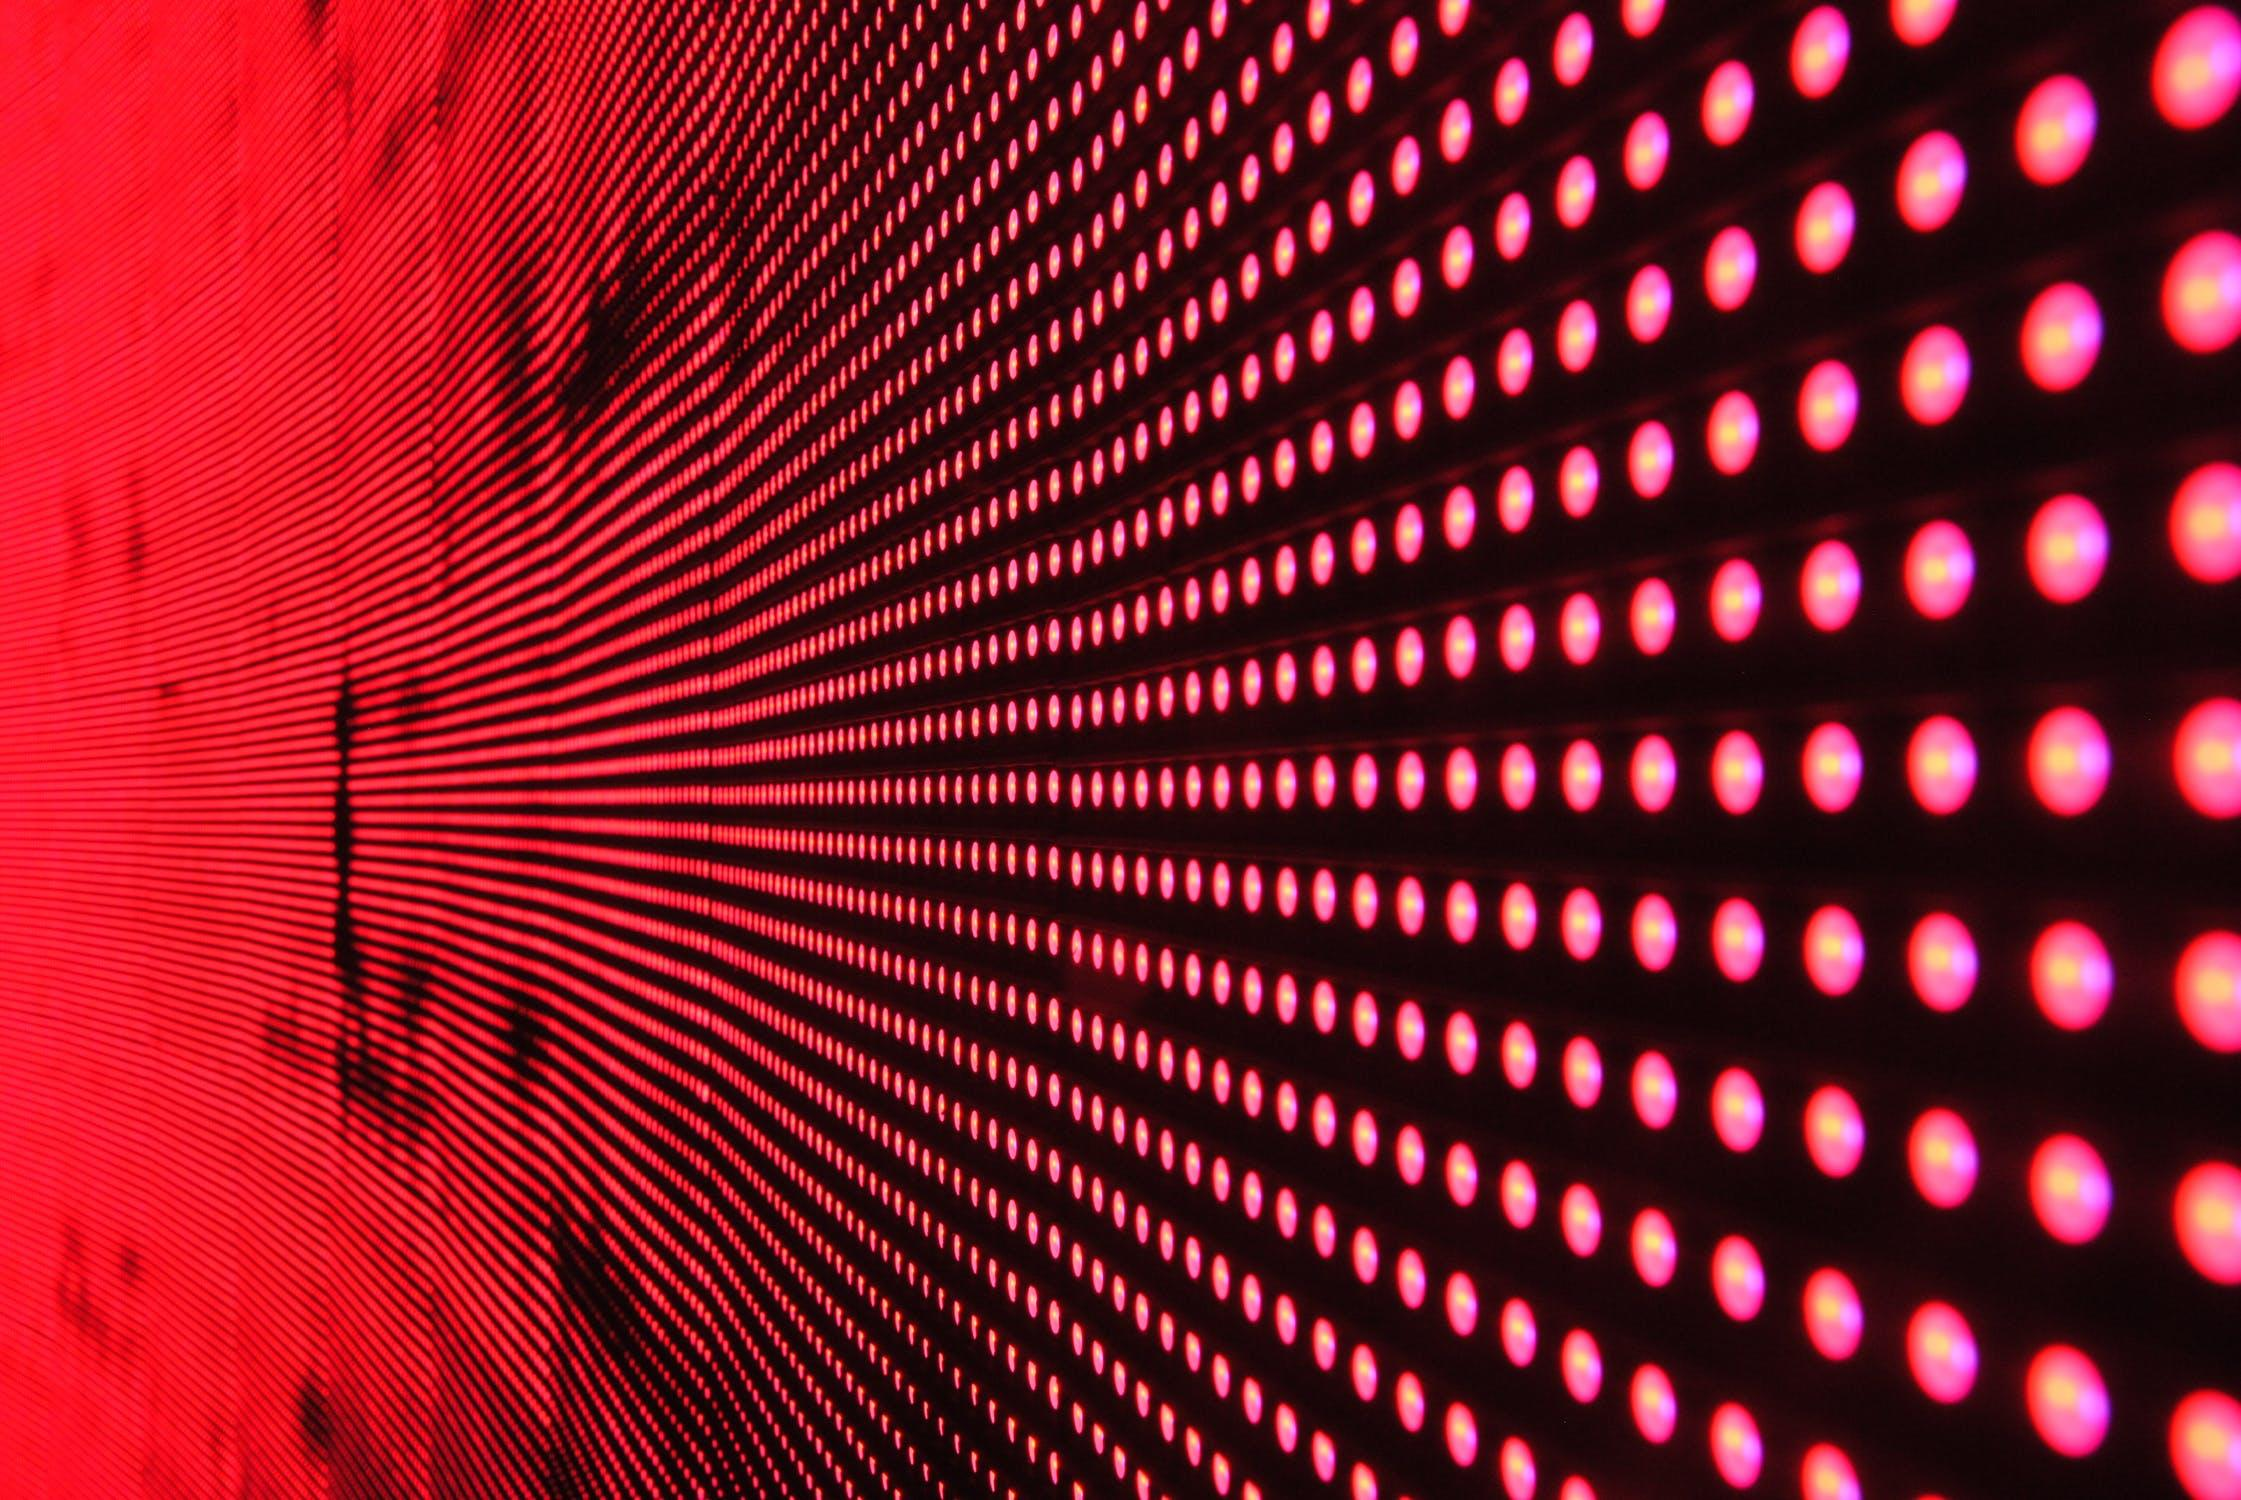 structure light led movement 158826 1 - Взлом Upbit — биржа подтвердила кражу 342 000 ETH